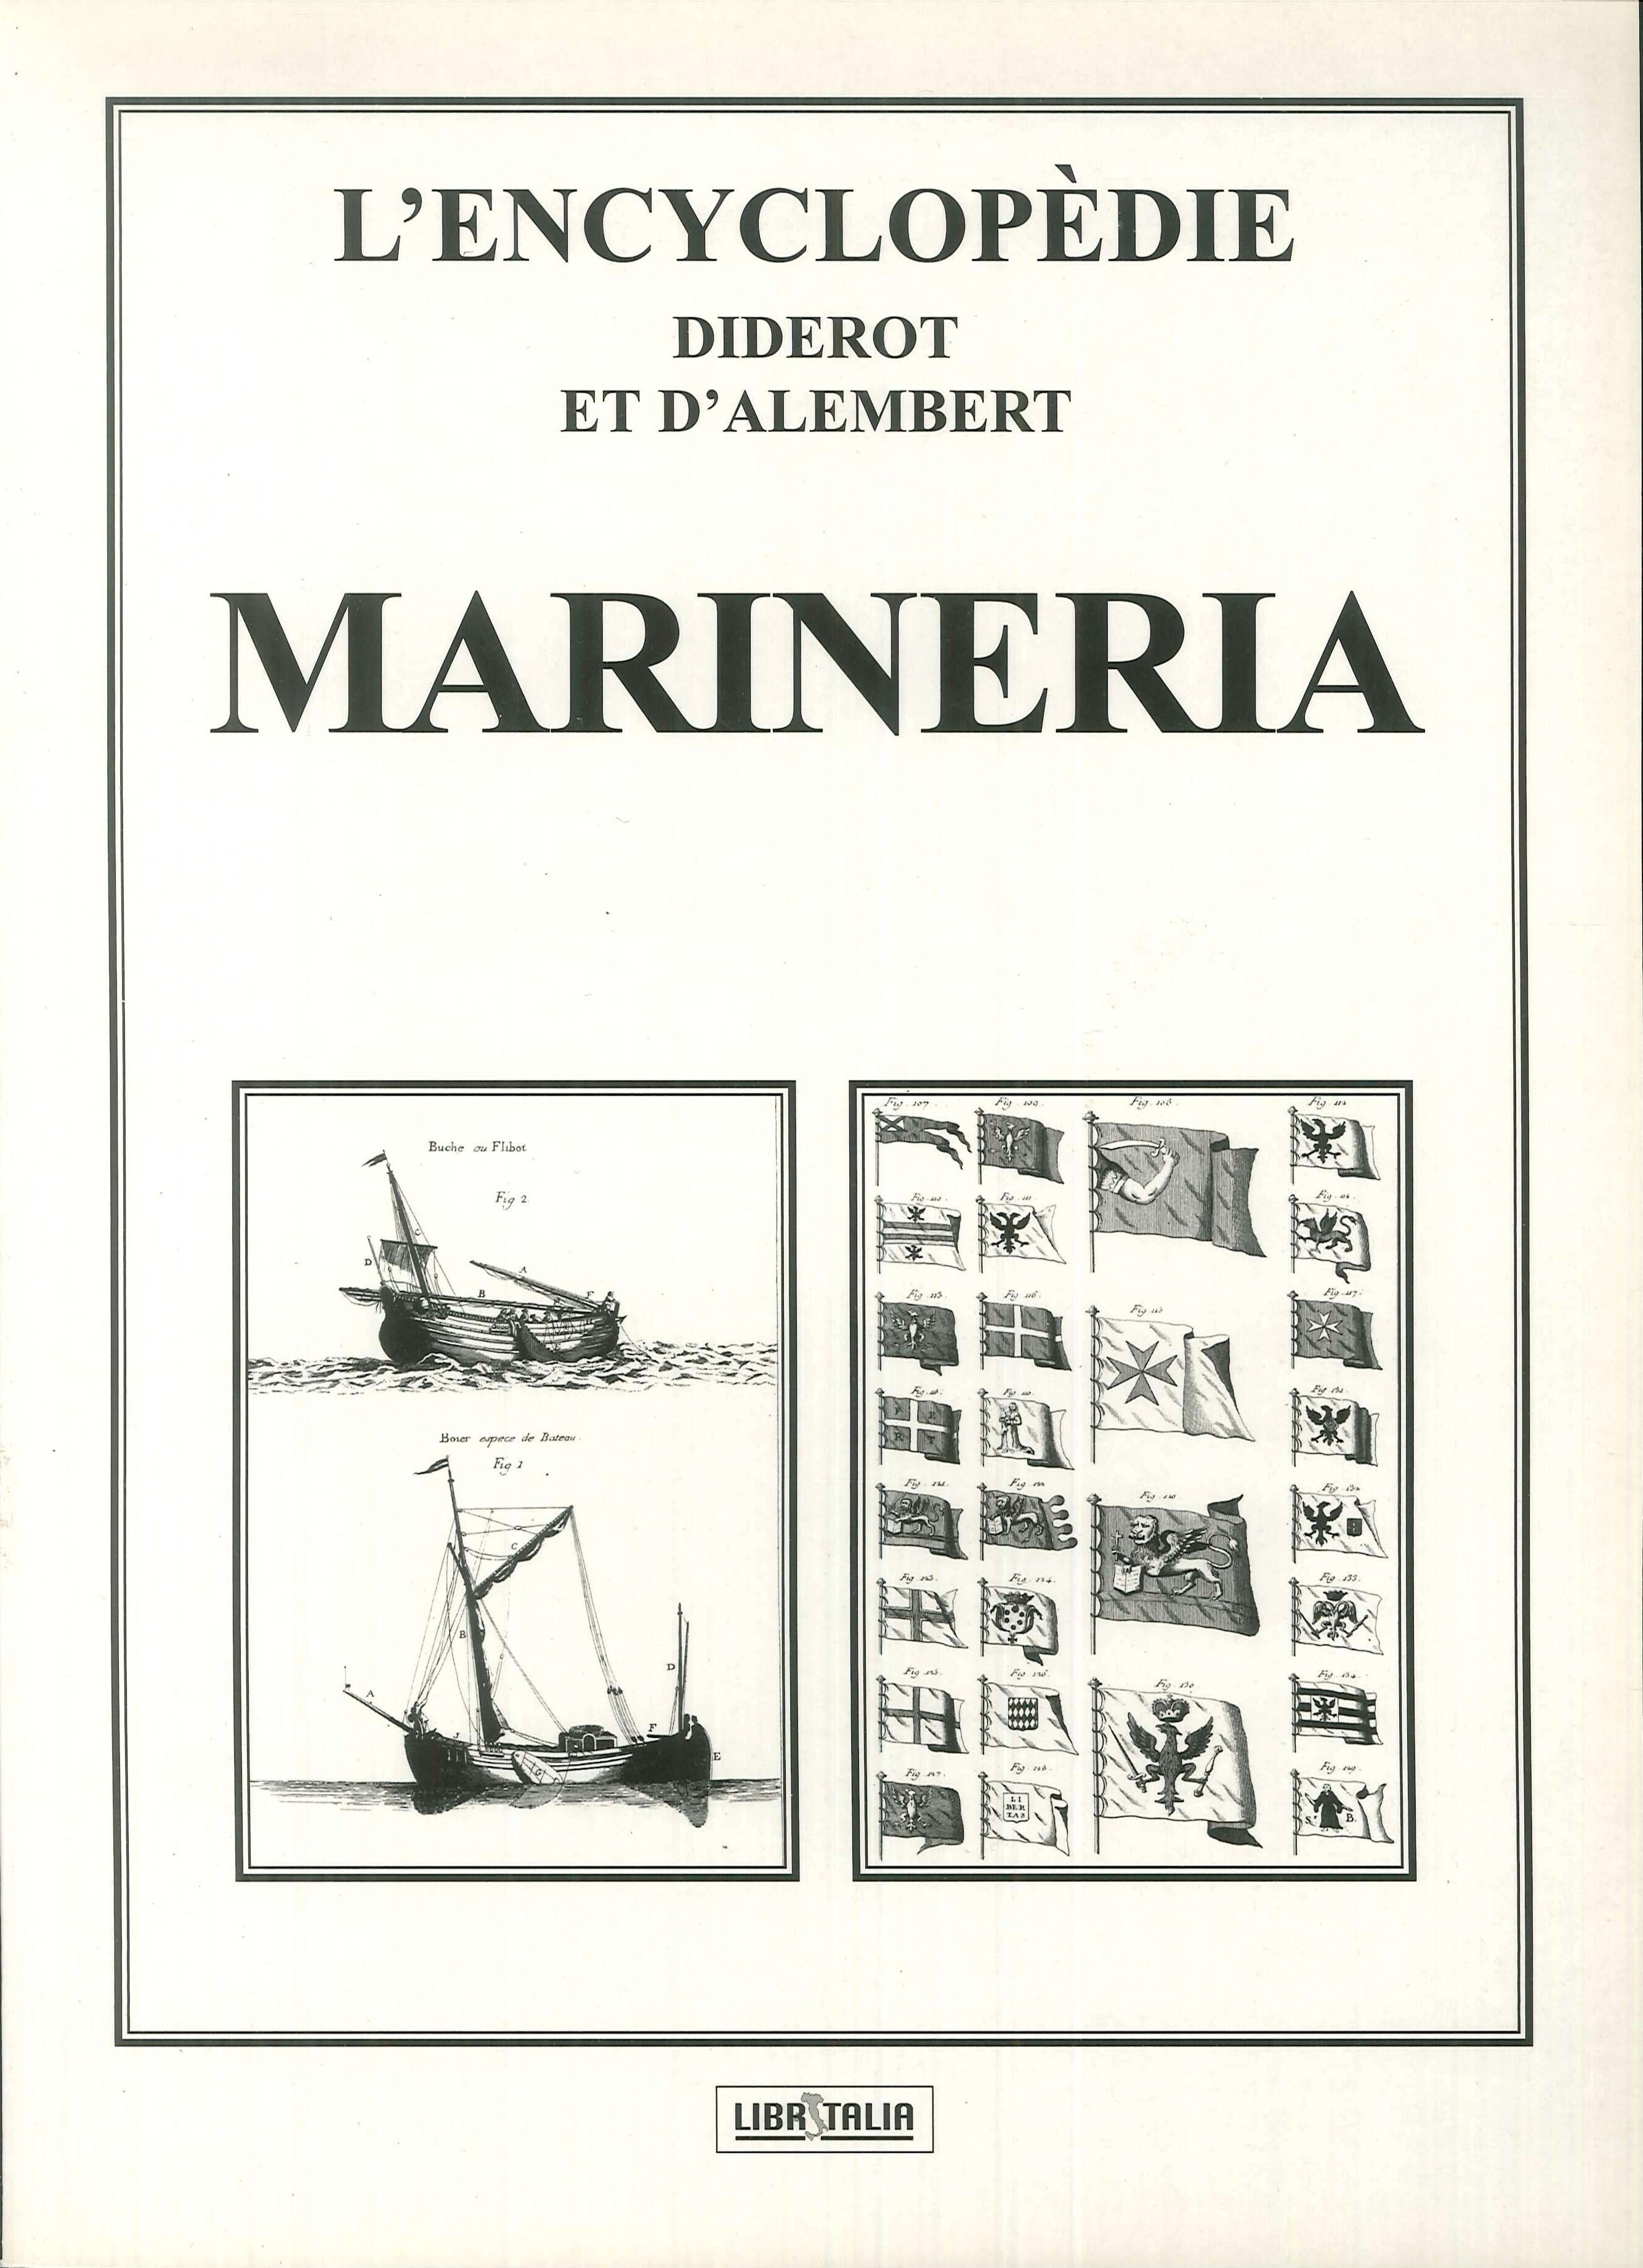 L'encyclopedie Diderot e D'Alembert. Marineria